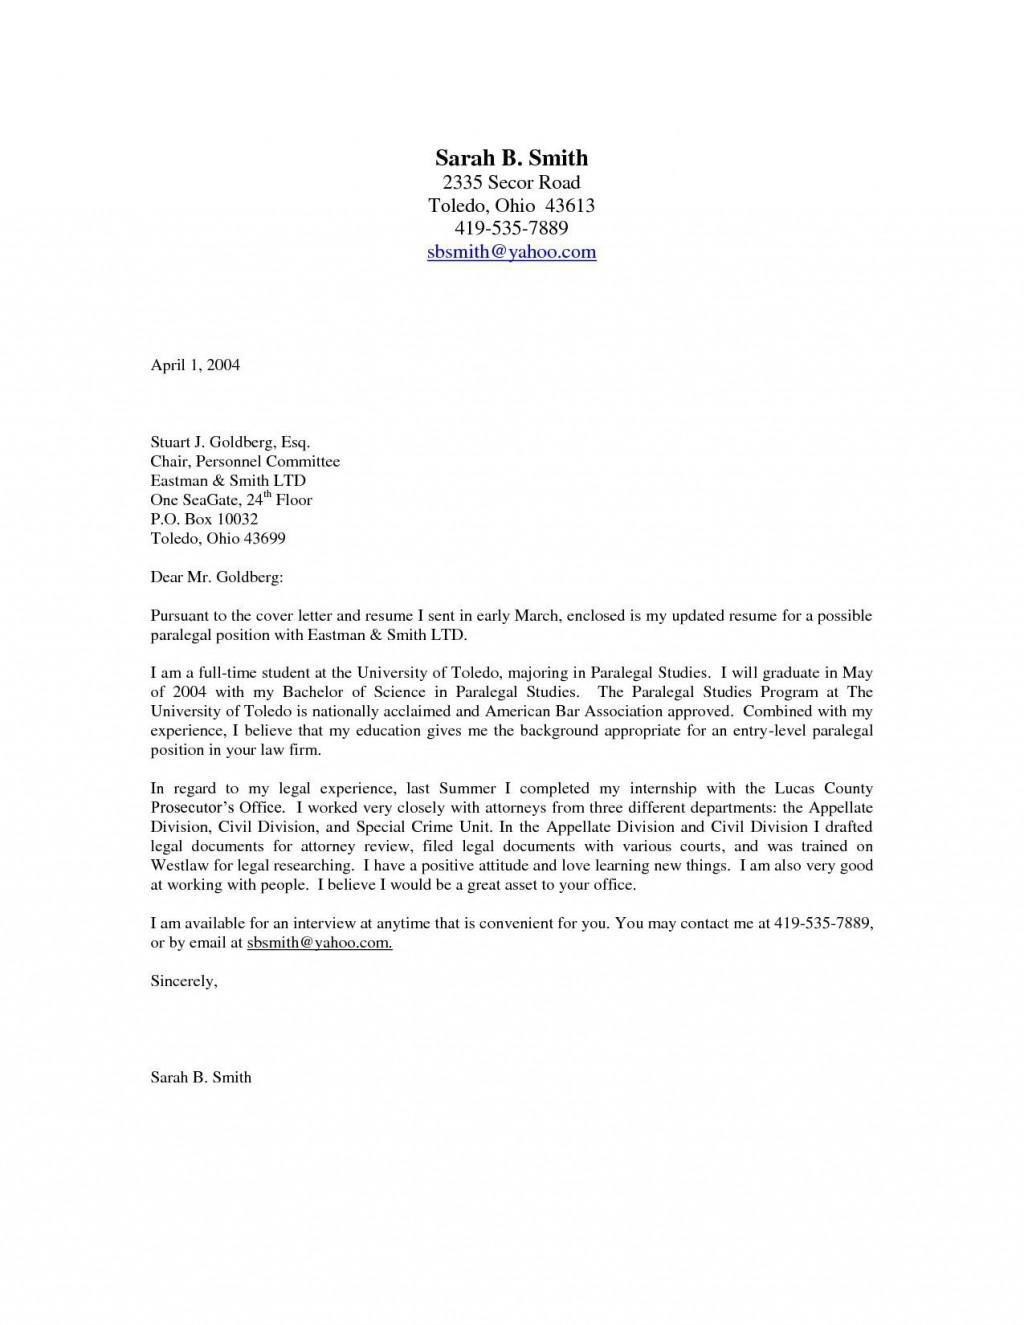 008 Imposing Google Doc Cover Letter Template Photo  Swis Free RedditLarge